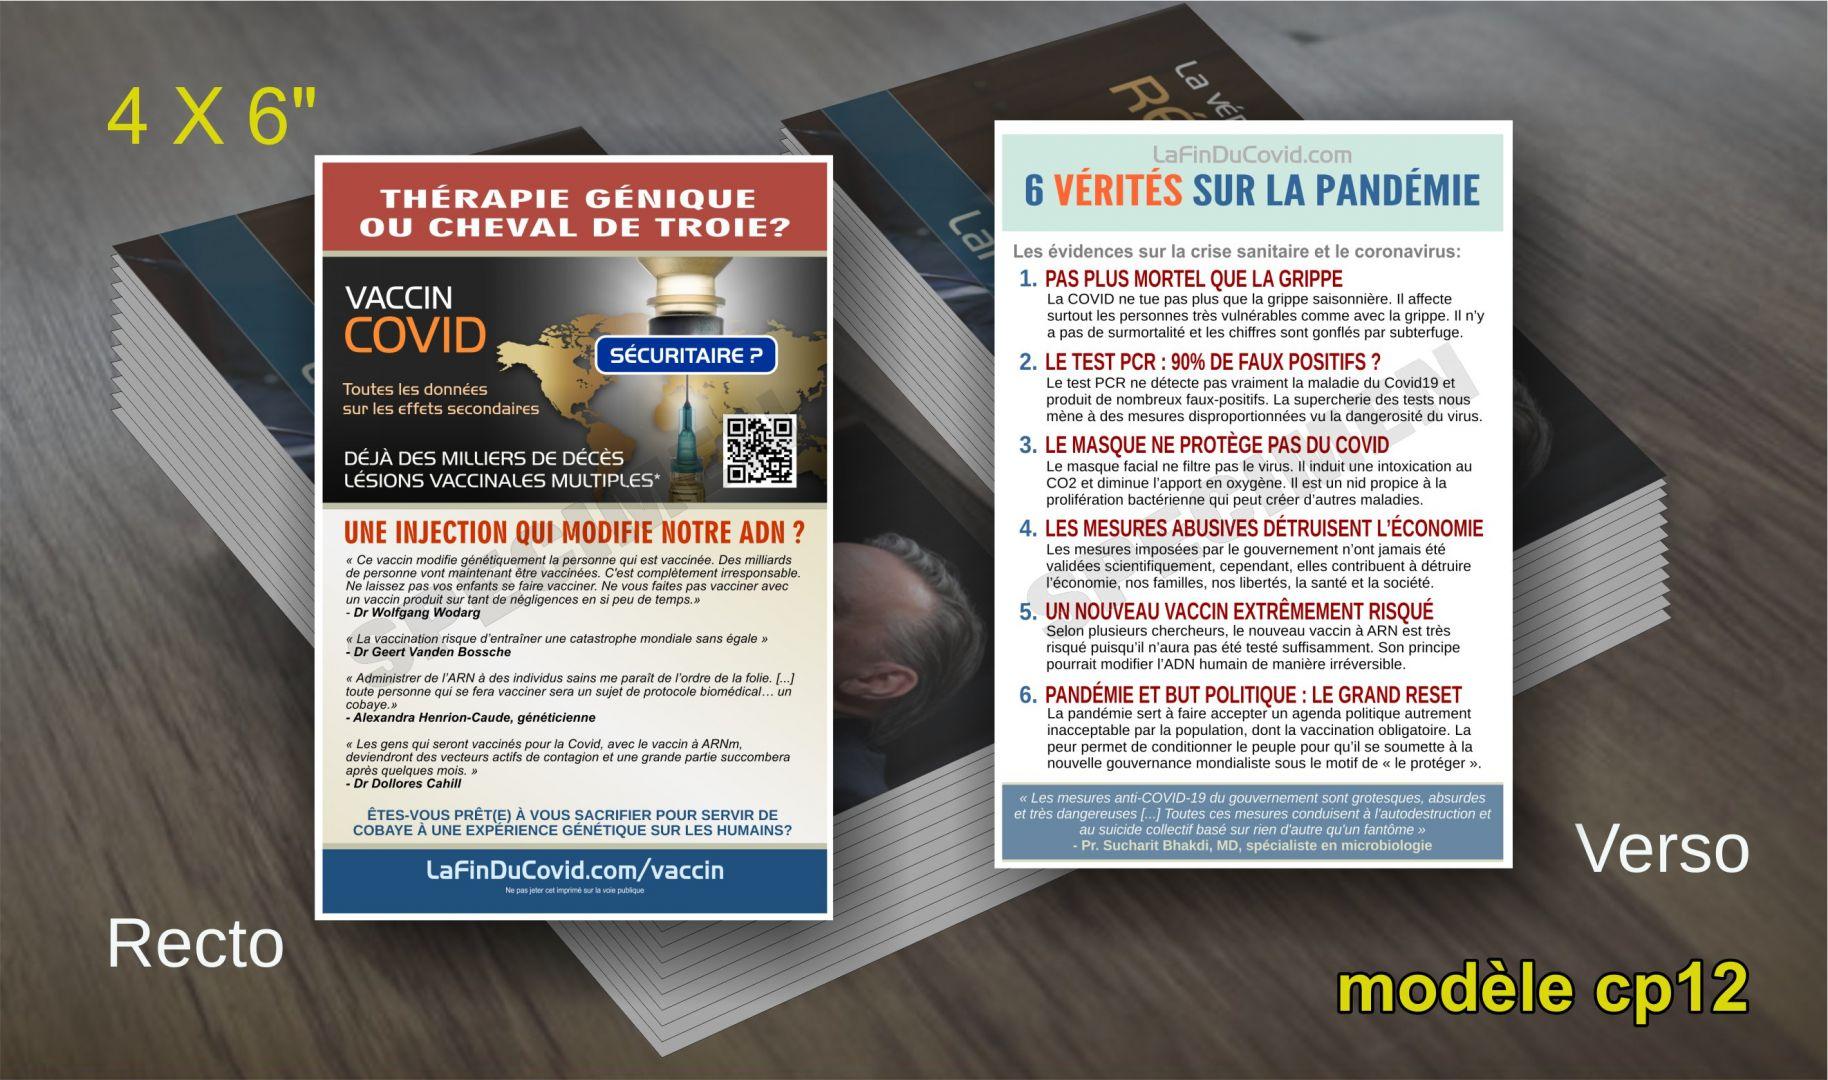 Cartes Postales (4x6) - (Dangers vaccin ARN - 6 vérités pandémie)